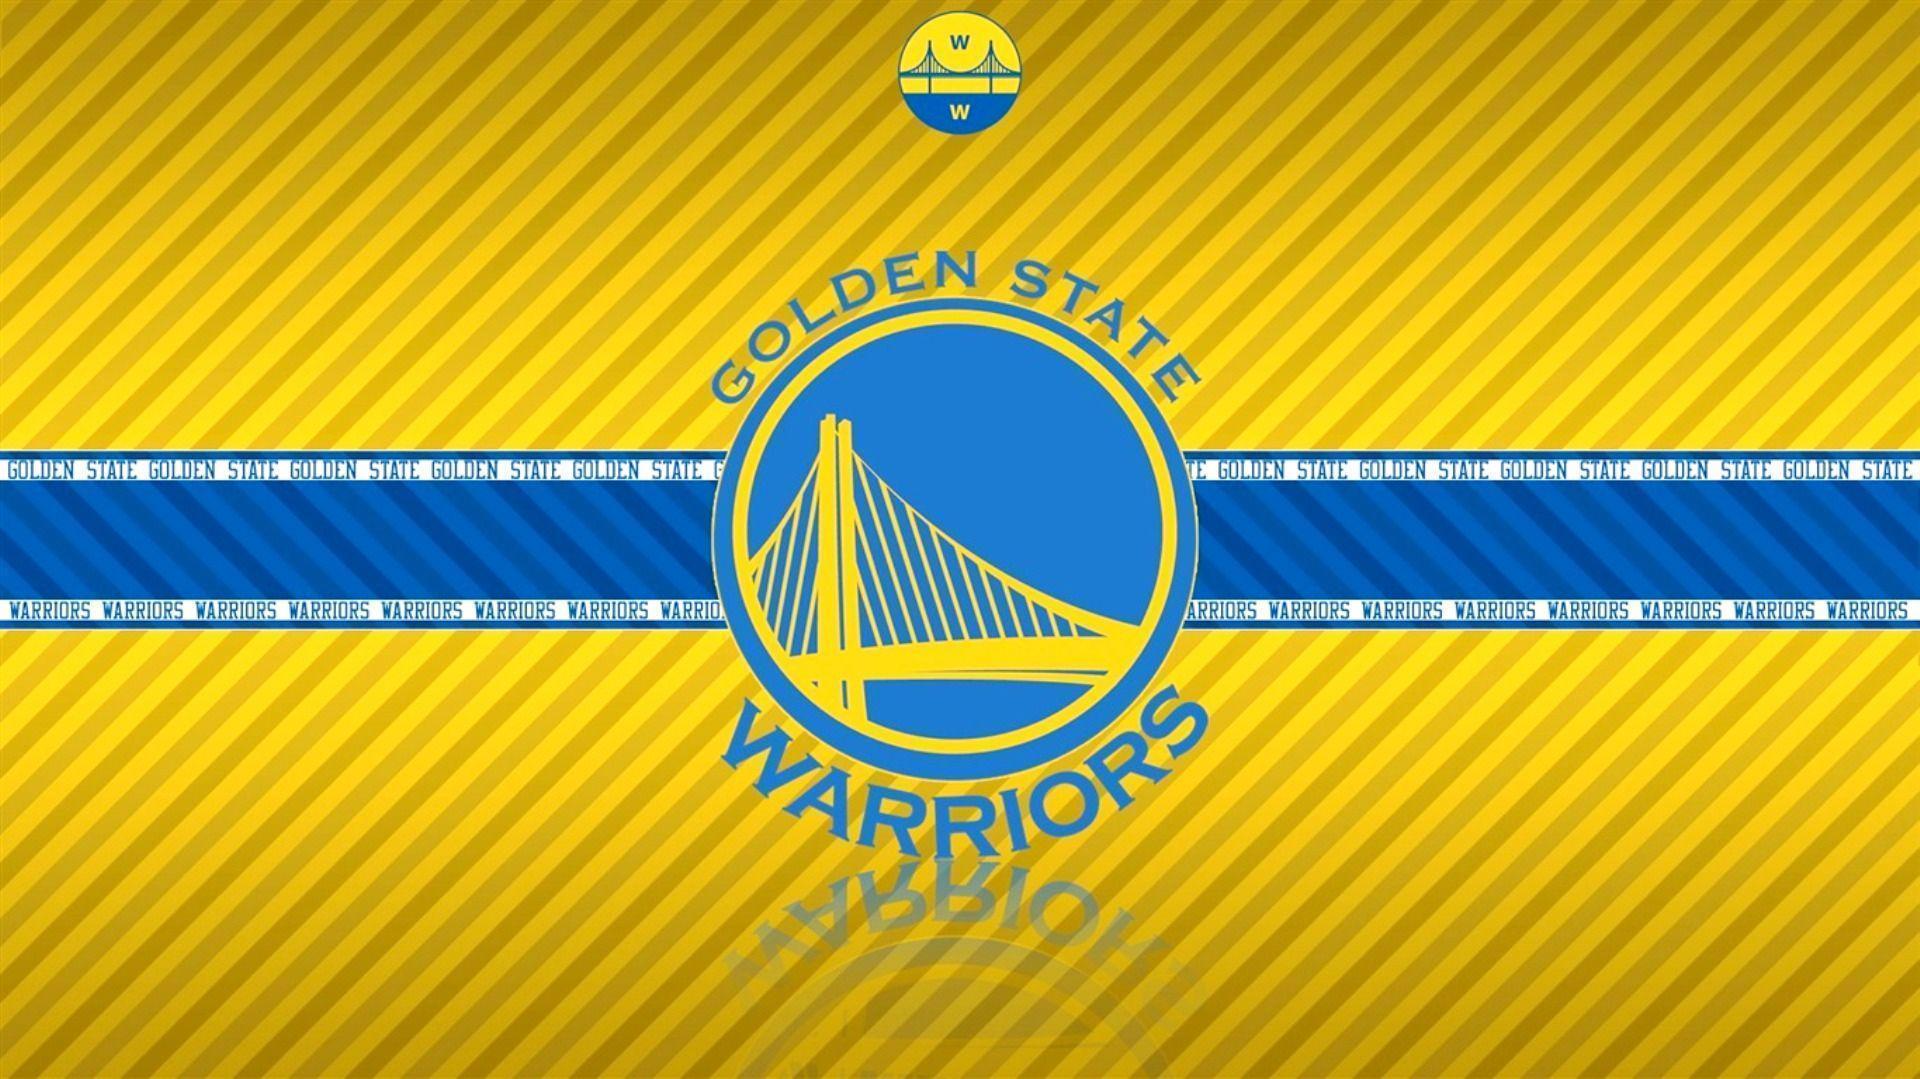 Golden State Warriors Wallpapers - Golden State Warriors Wallpaper Ipad , HD Wallpaper & Backgrounds